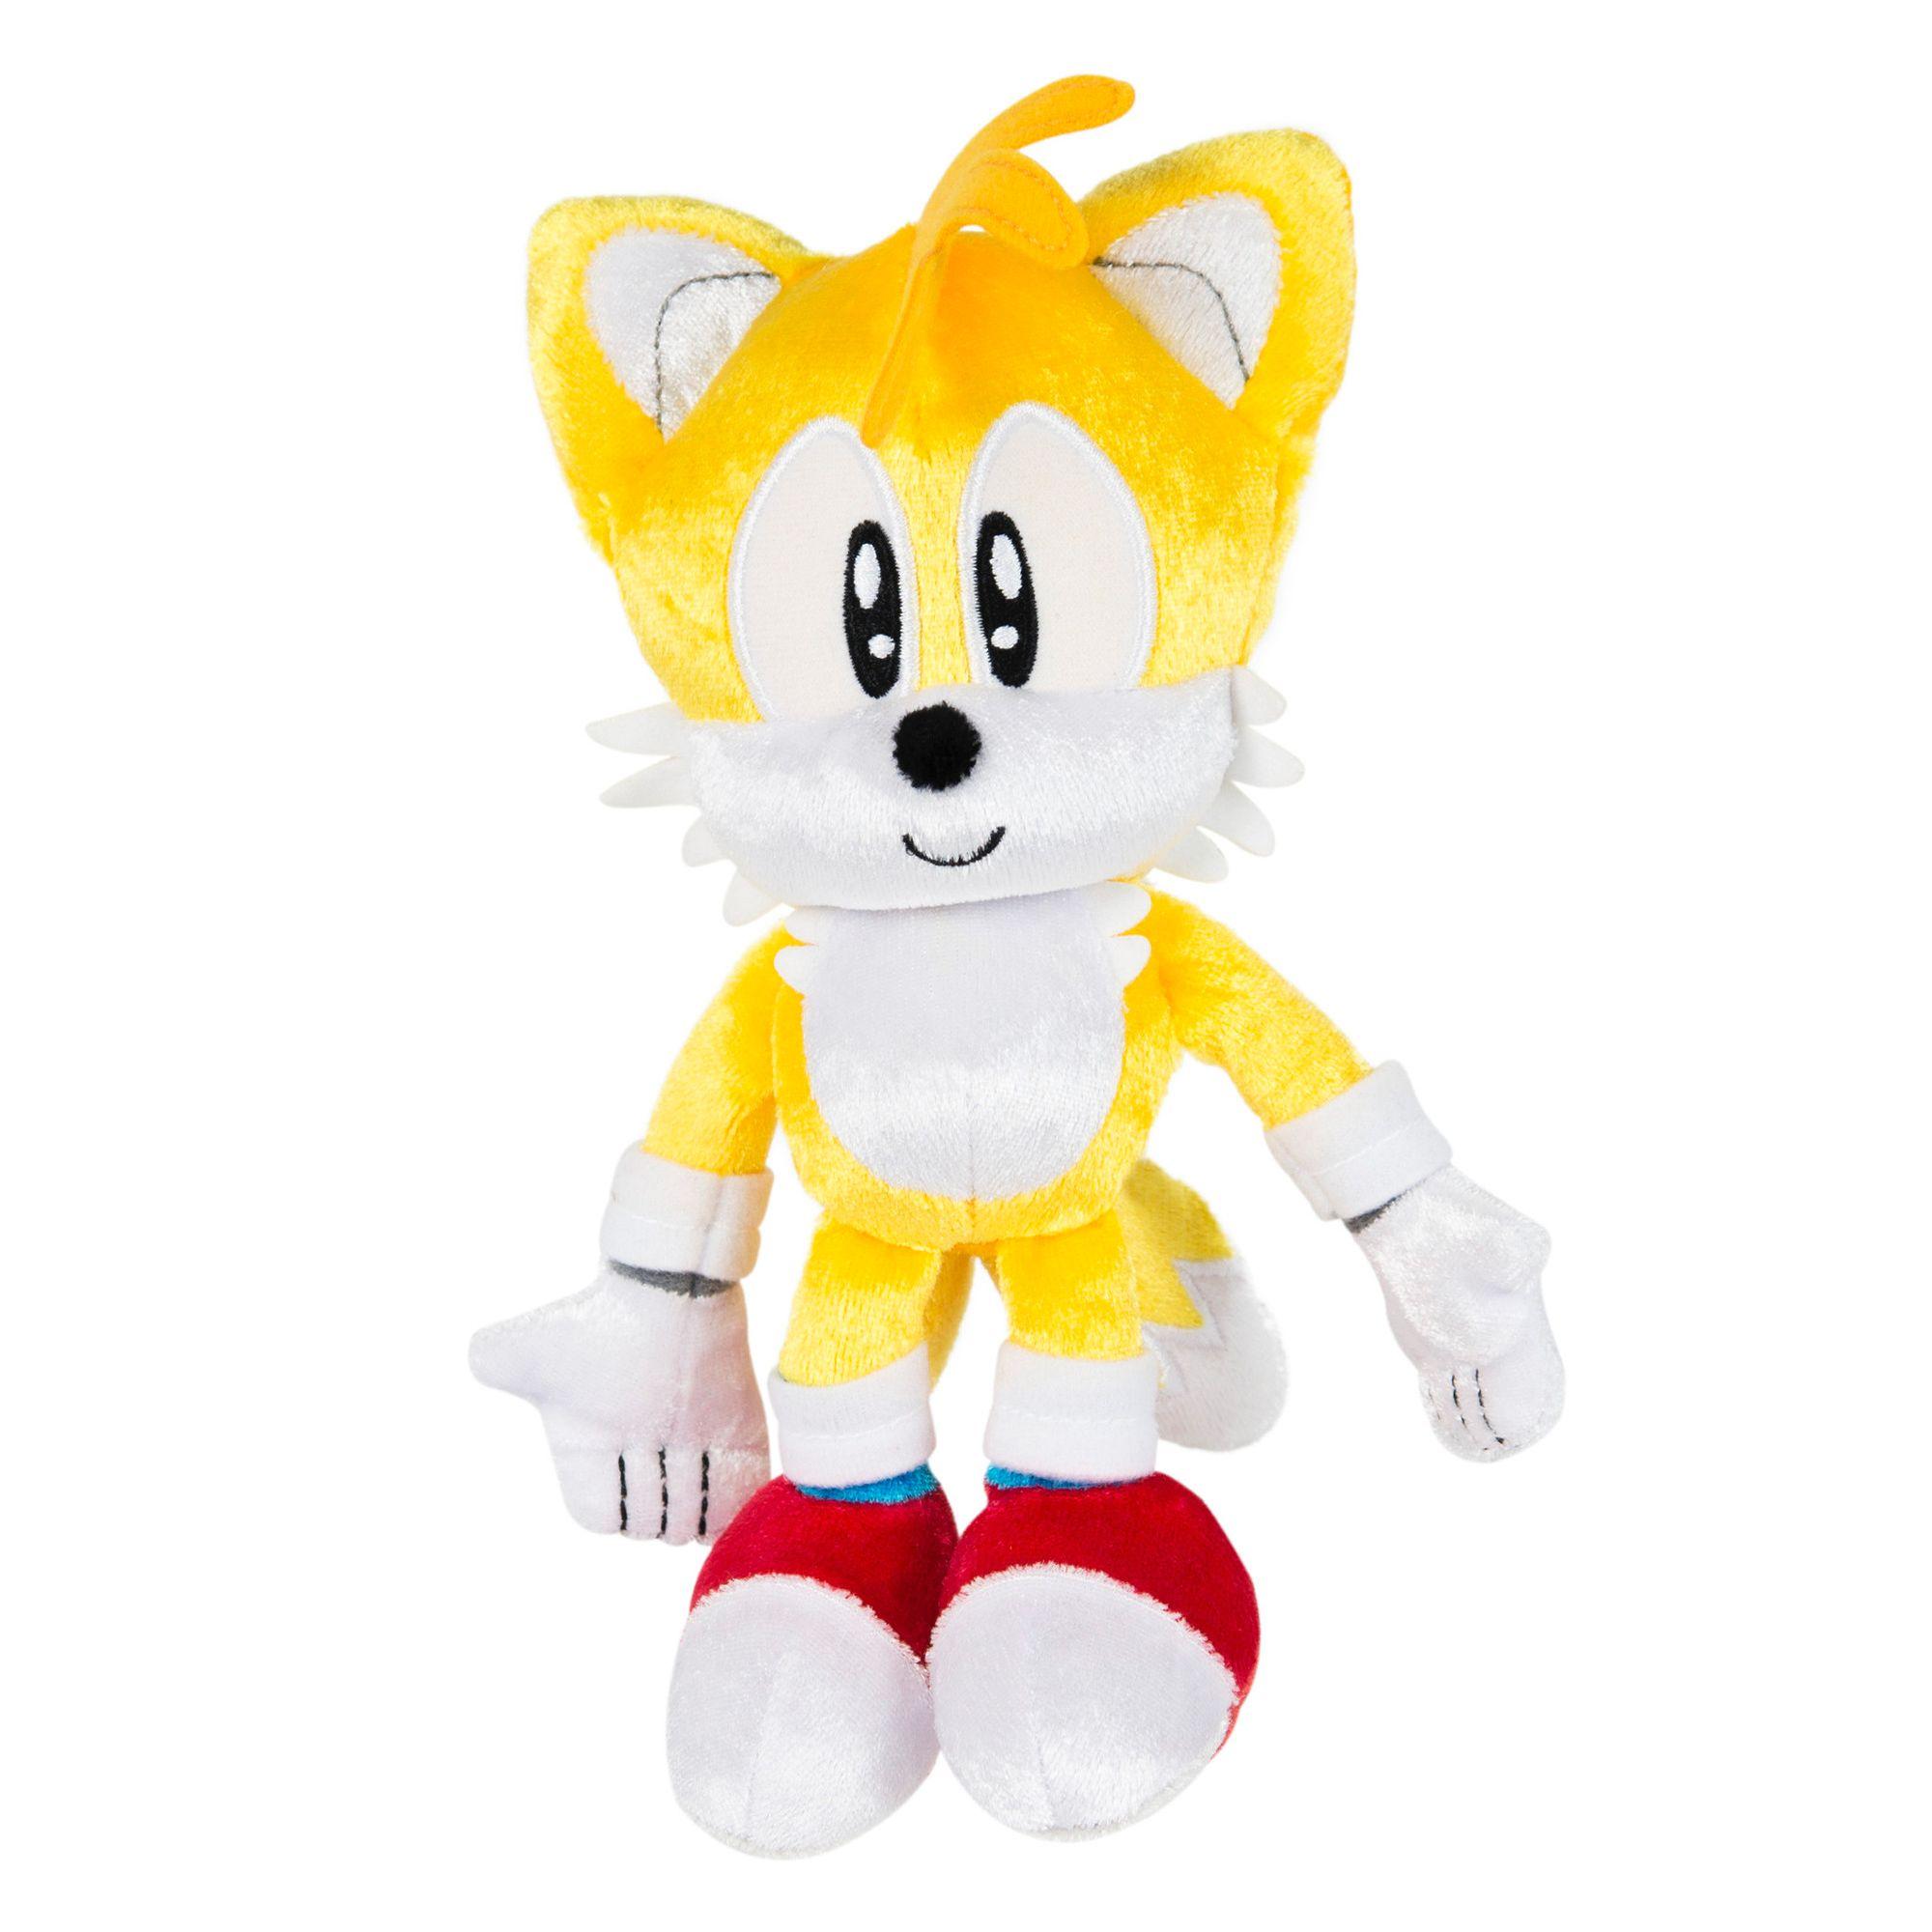 Sonic The Hedgehog 25th Anniversary Small Plush Tails 1992 Sonic 25th Anniversary Sonic Plush Toys Plush